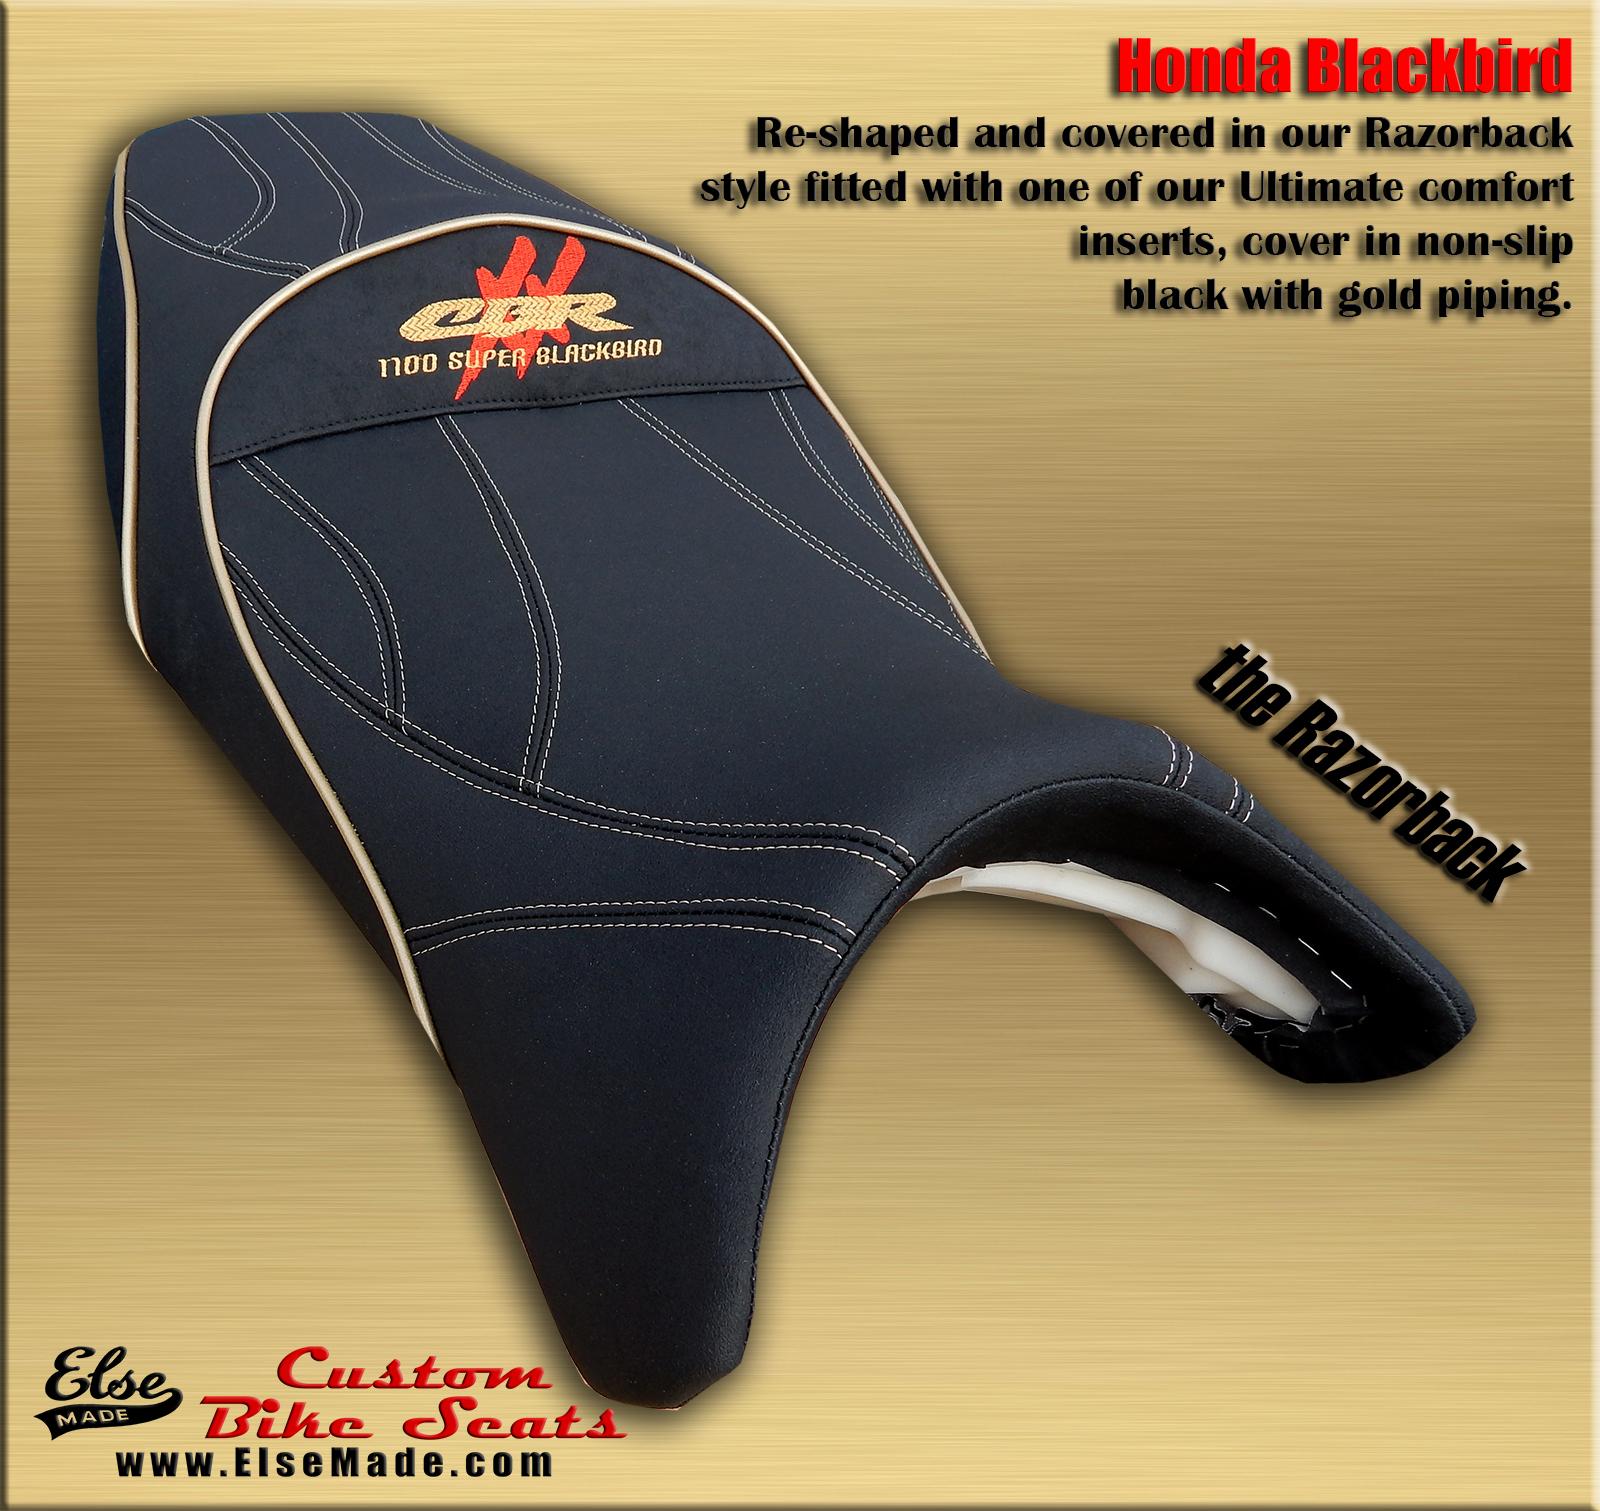 blackbird razorback 9 full size.jpg